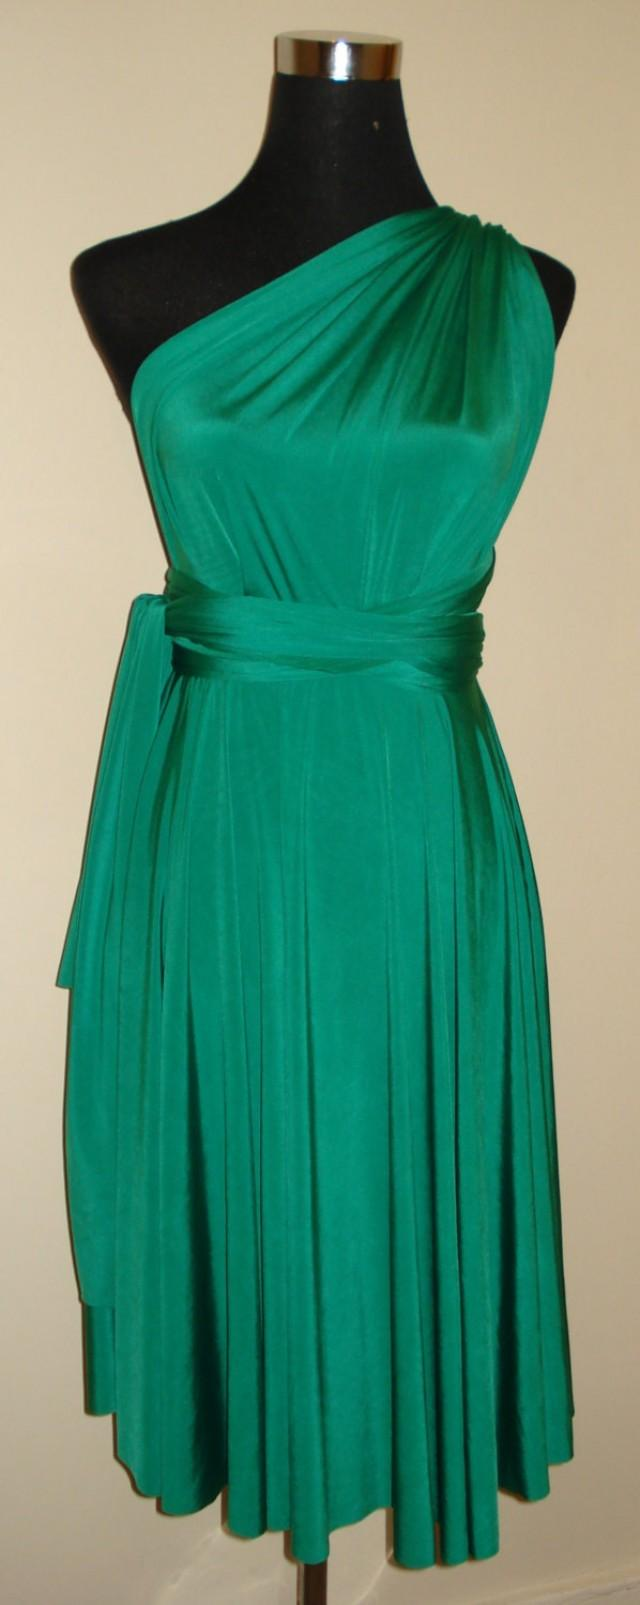 Emerald Green Knee Length Infinity Dress Bridesmaid Wedding Dress ...